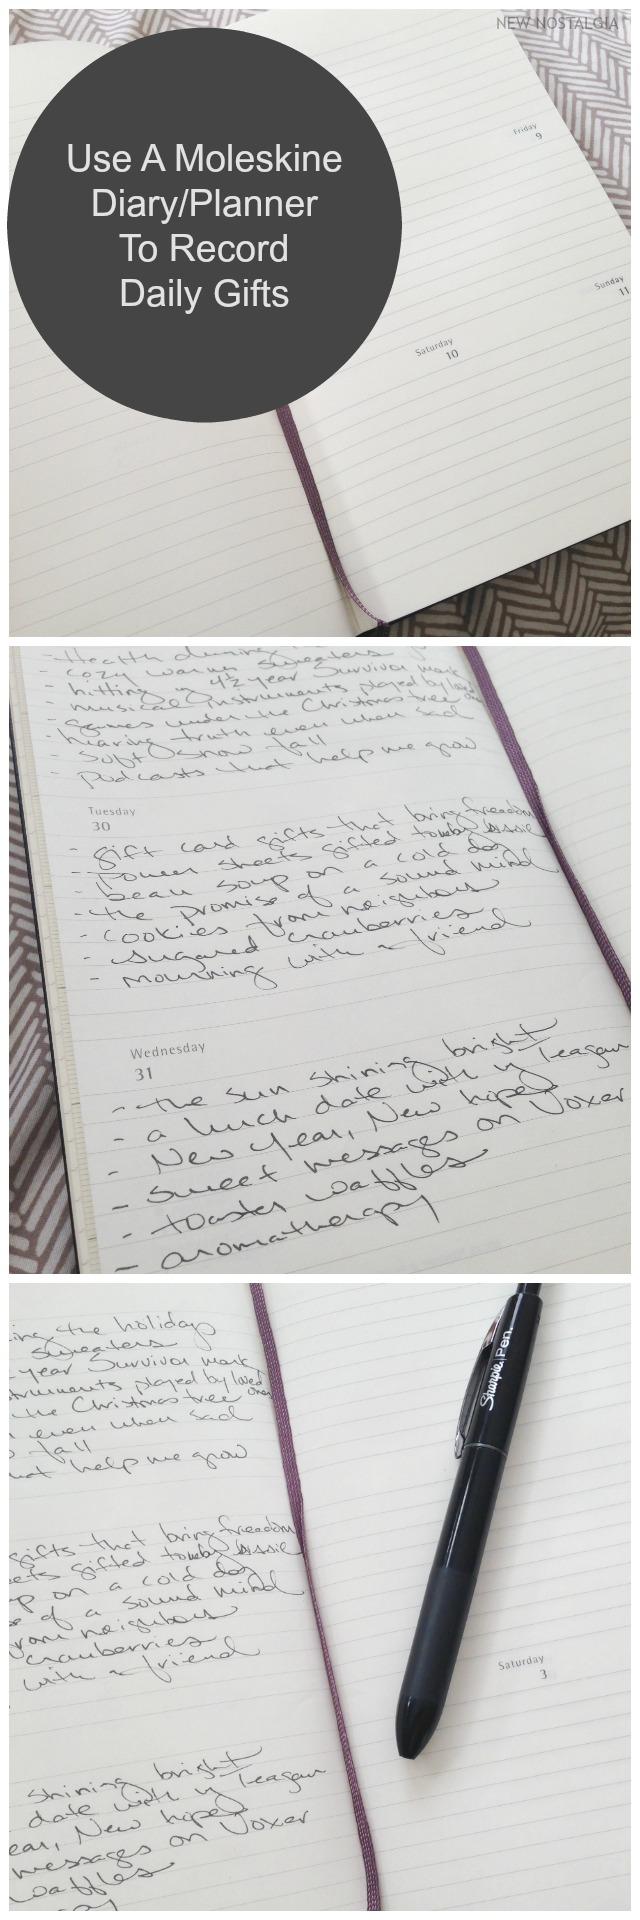 Moleskine Journal 2